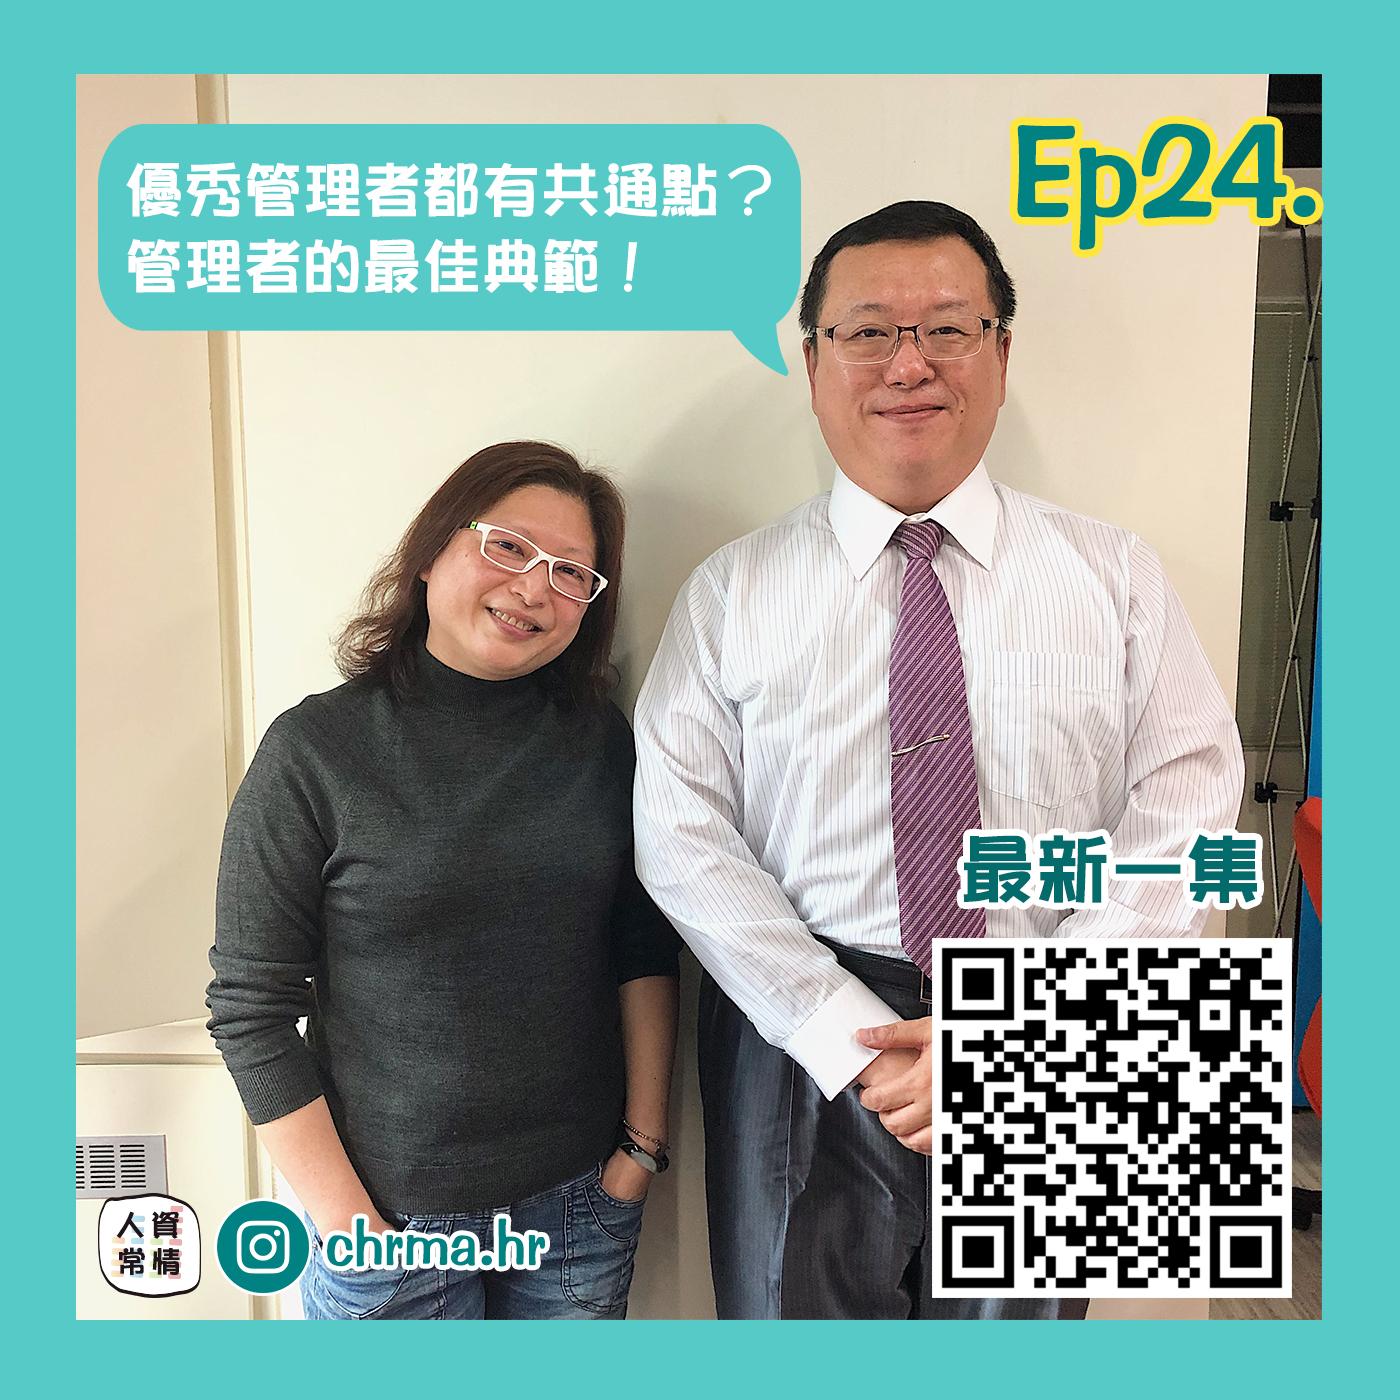 EP24 人資是個闢 - 優秀管理者的共通點?管理者的最佳典範!feat.滕儒老師